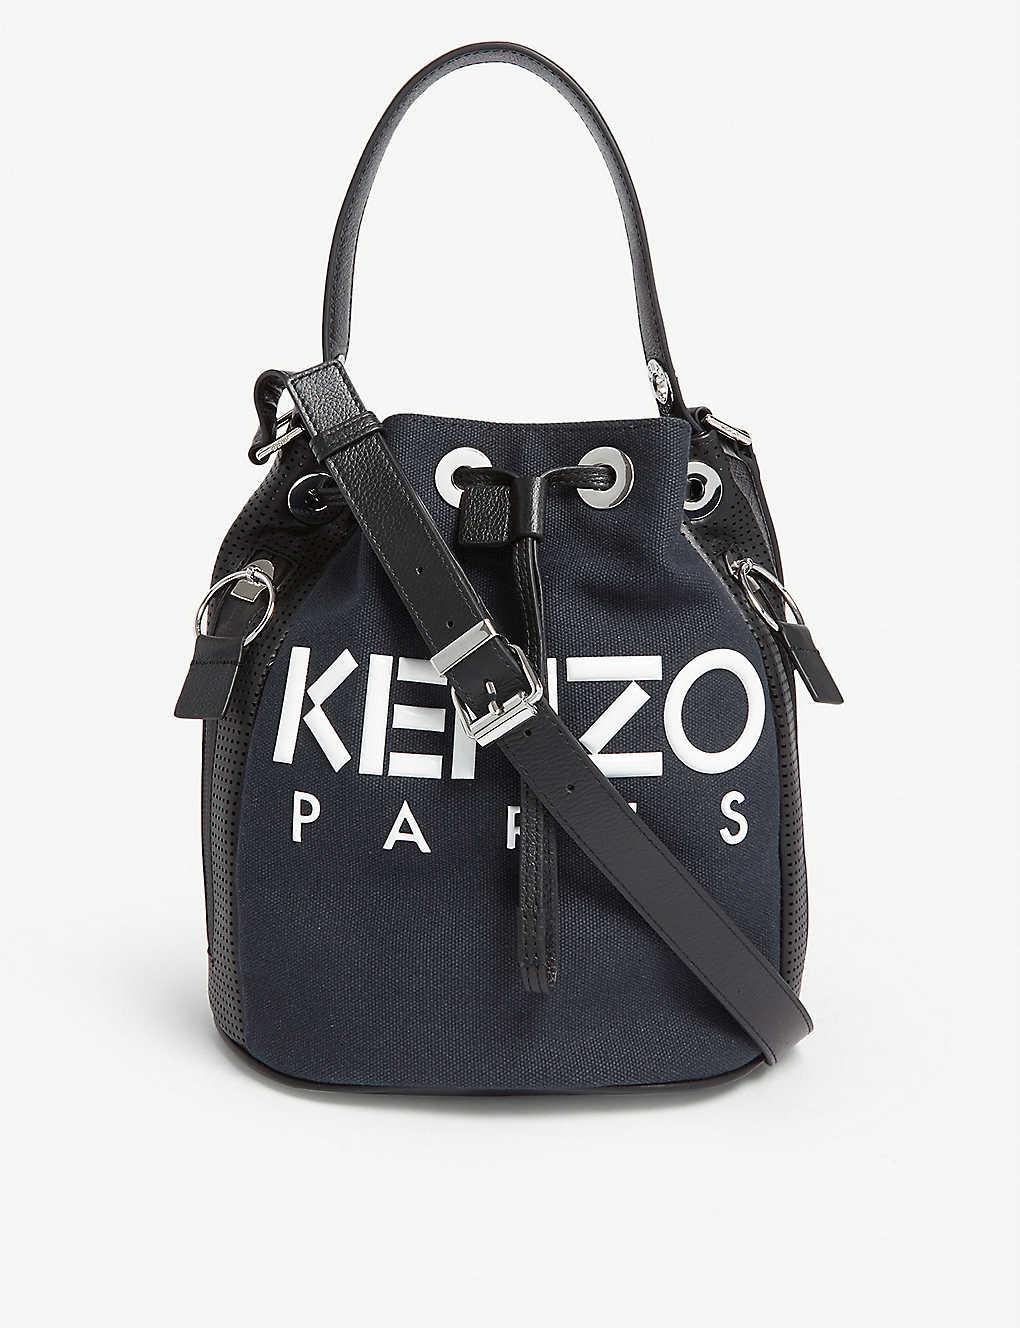 40685f37f7 KENZO - Bucket bag | Selfridges.com